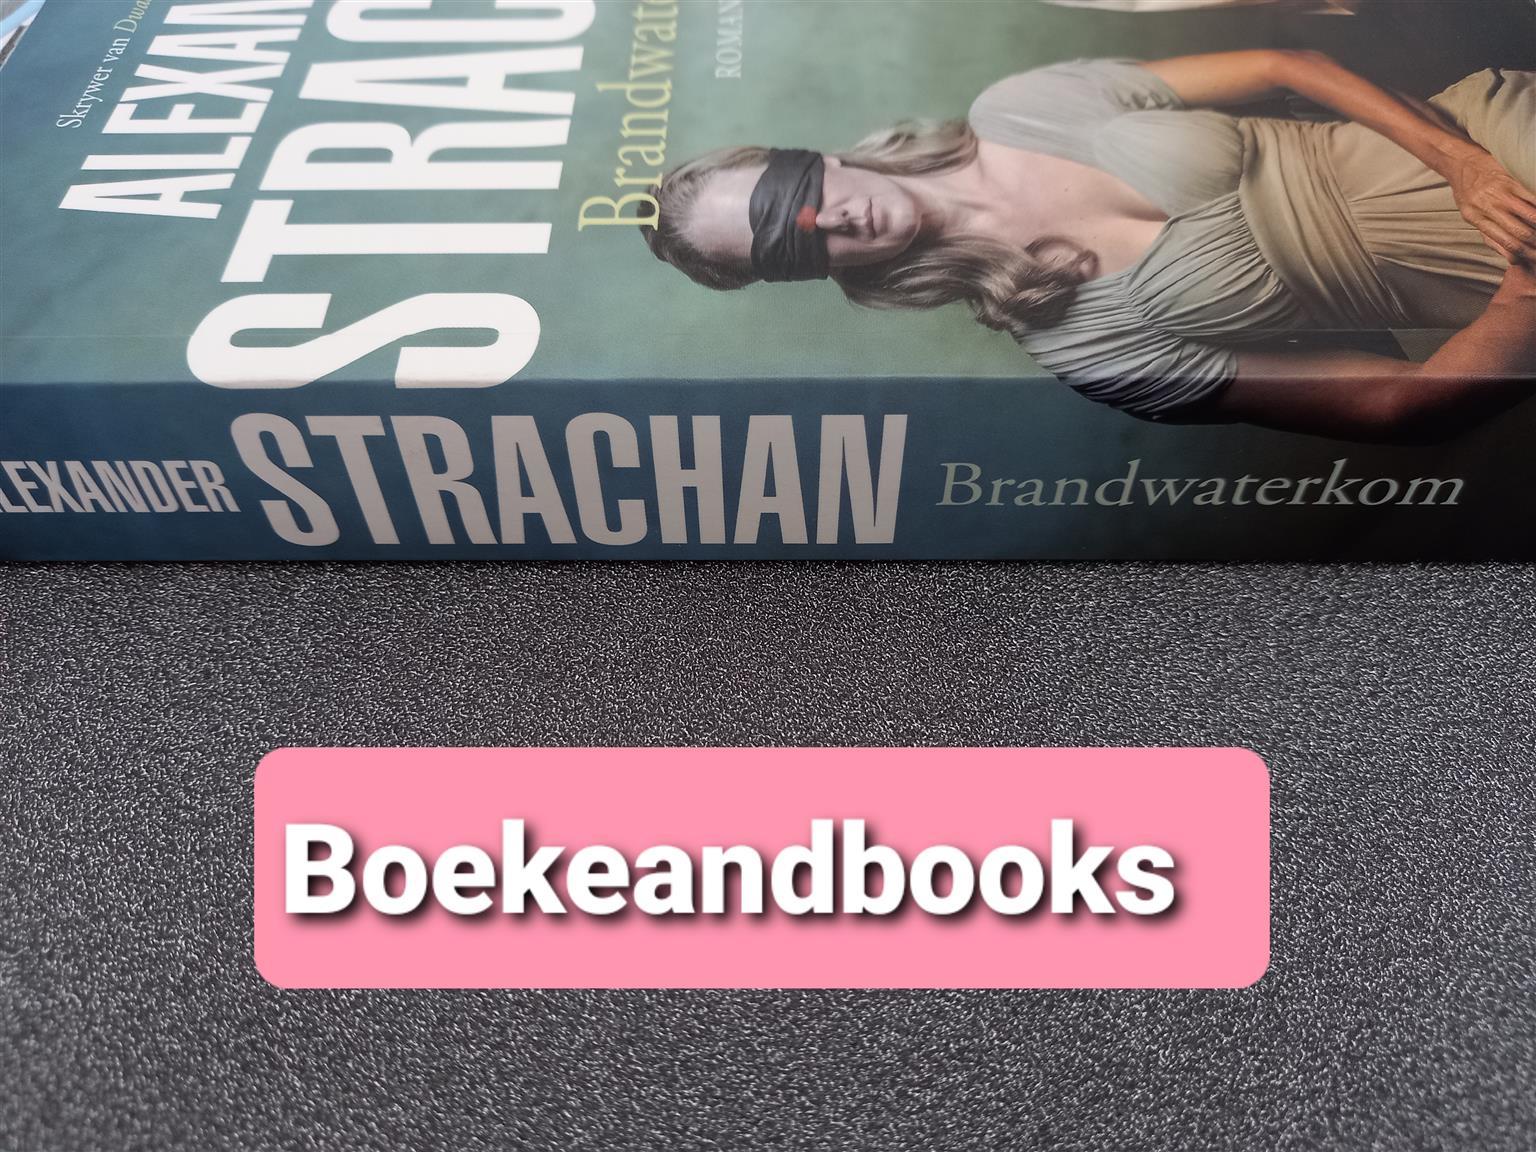 Brandwaterkom - Alexander Strachan.